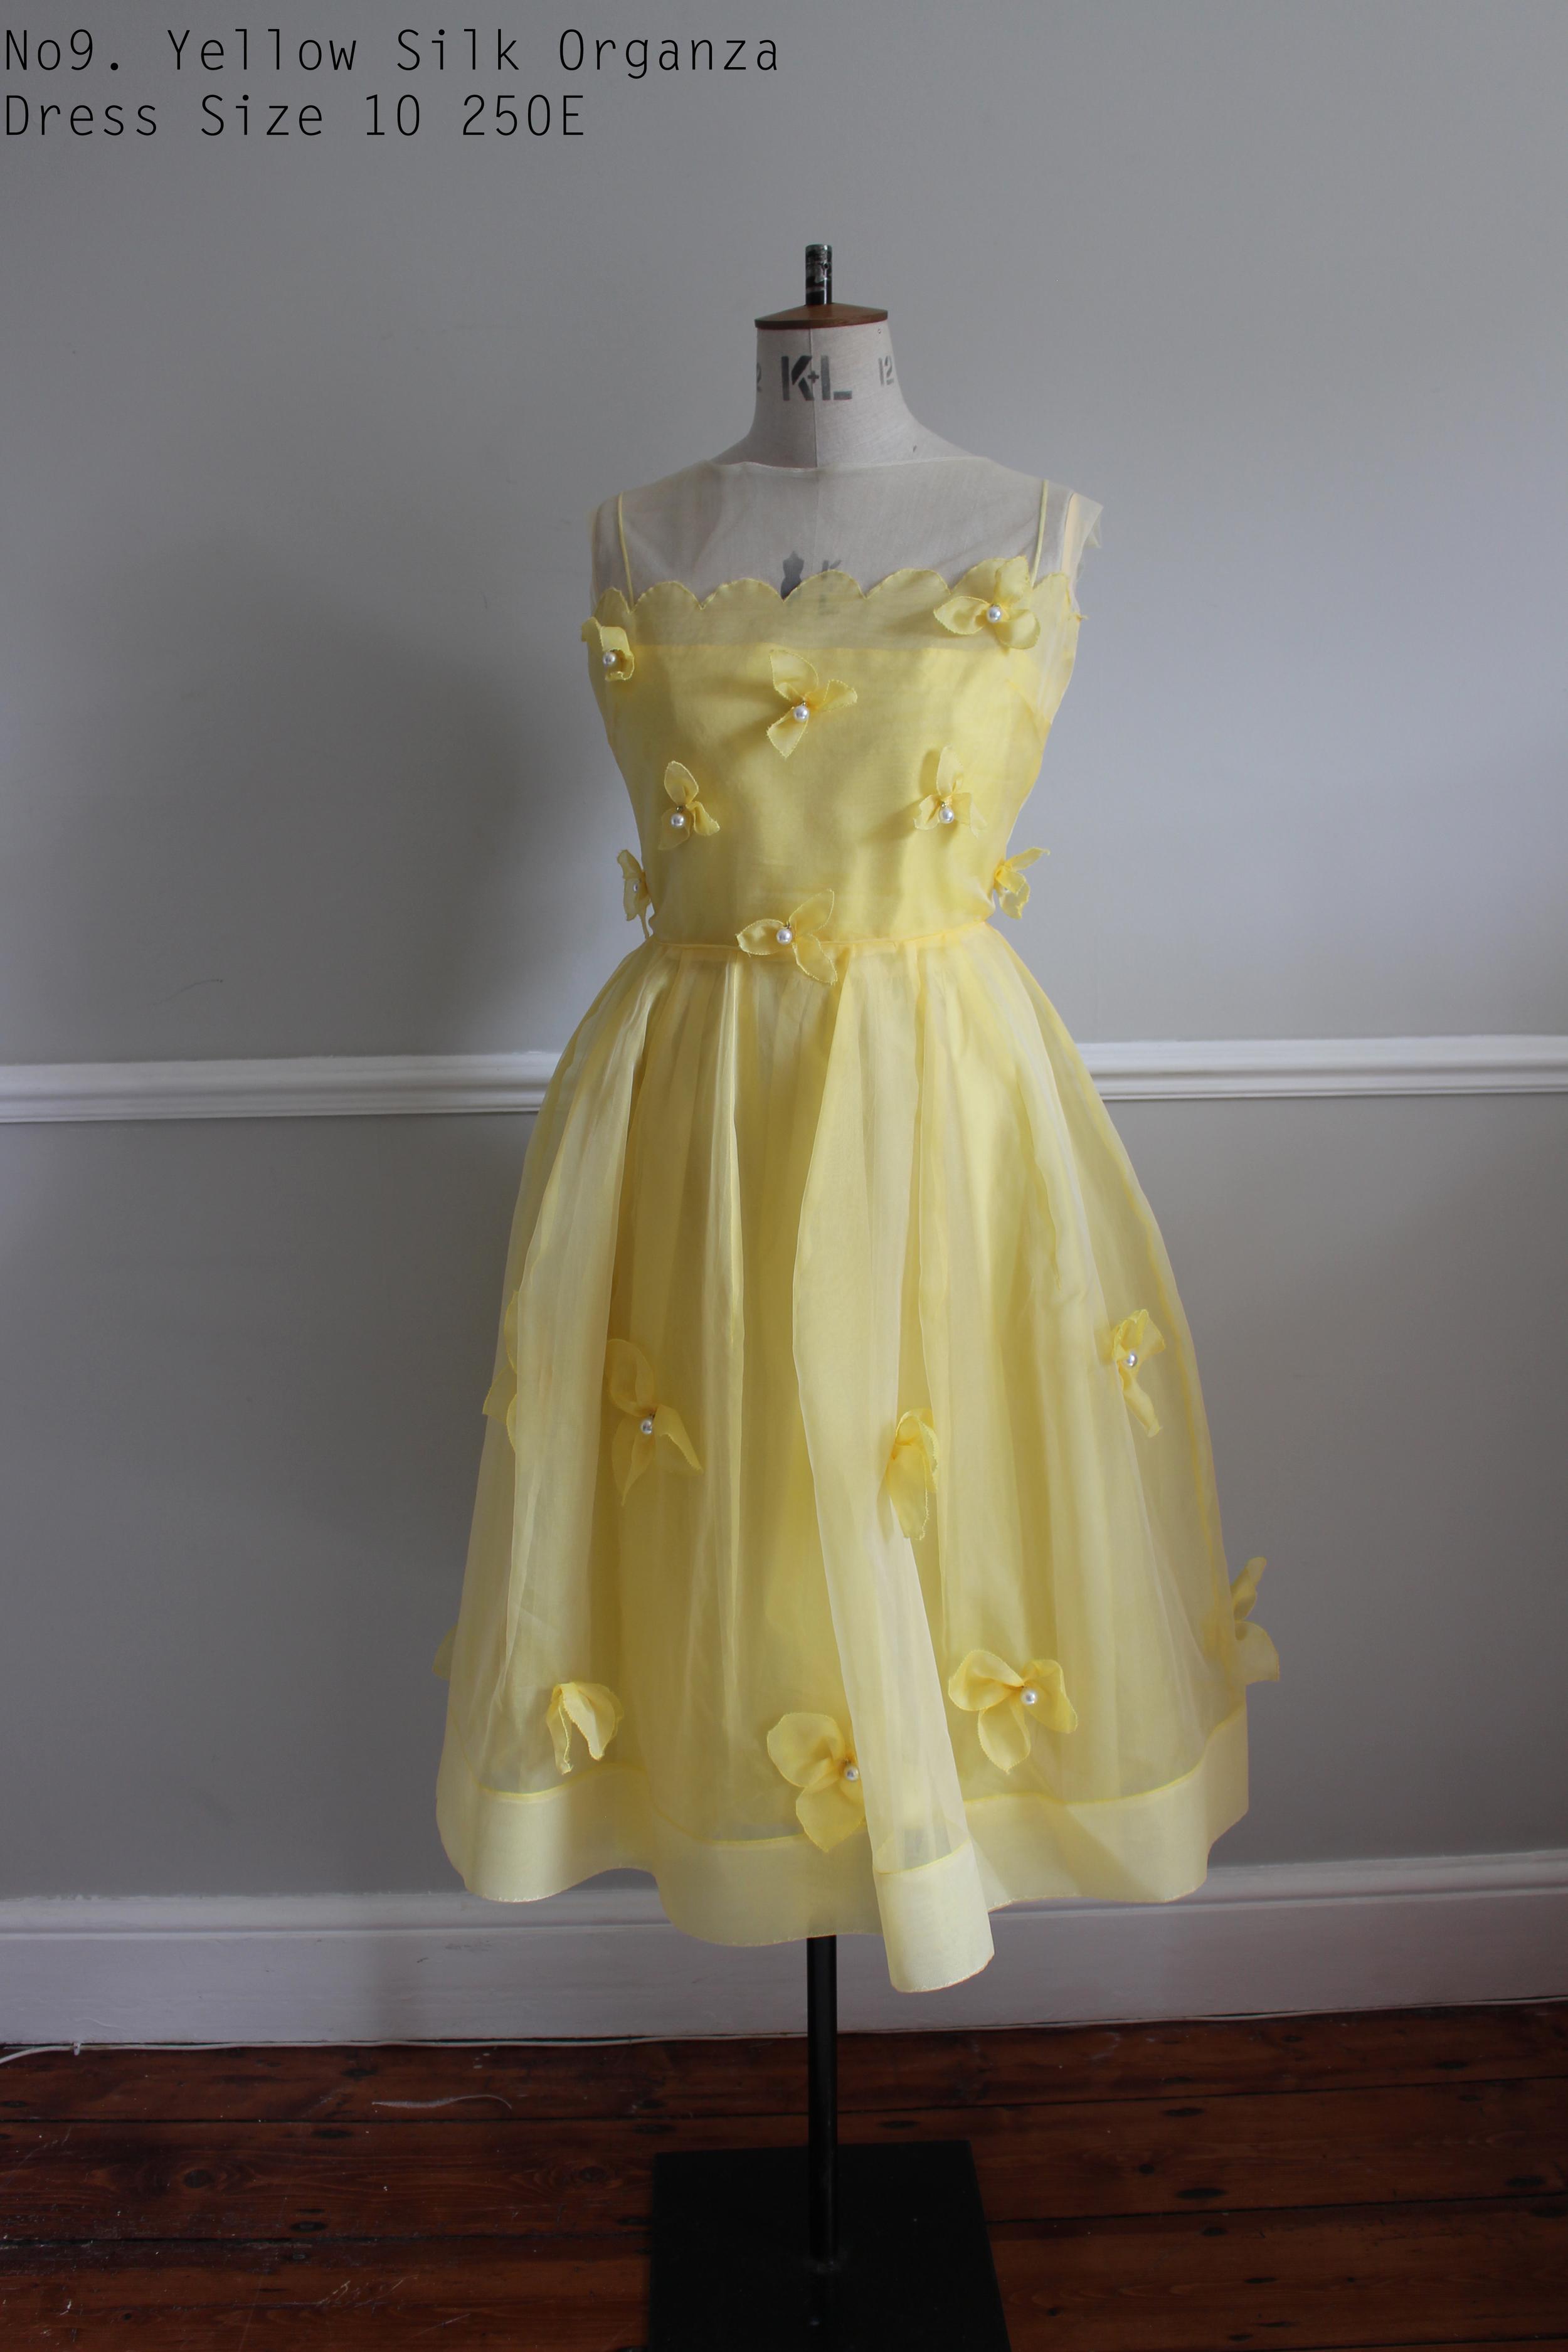 No9. Yellow Silk Organza Dress Size 10 250E.jpg